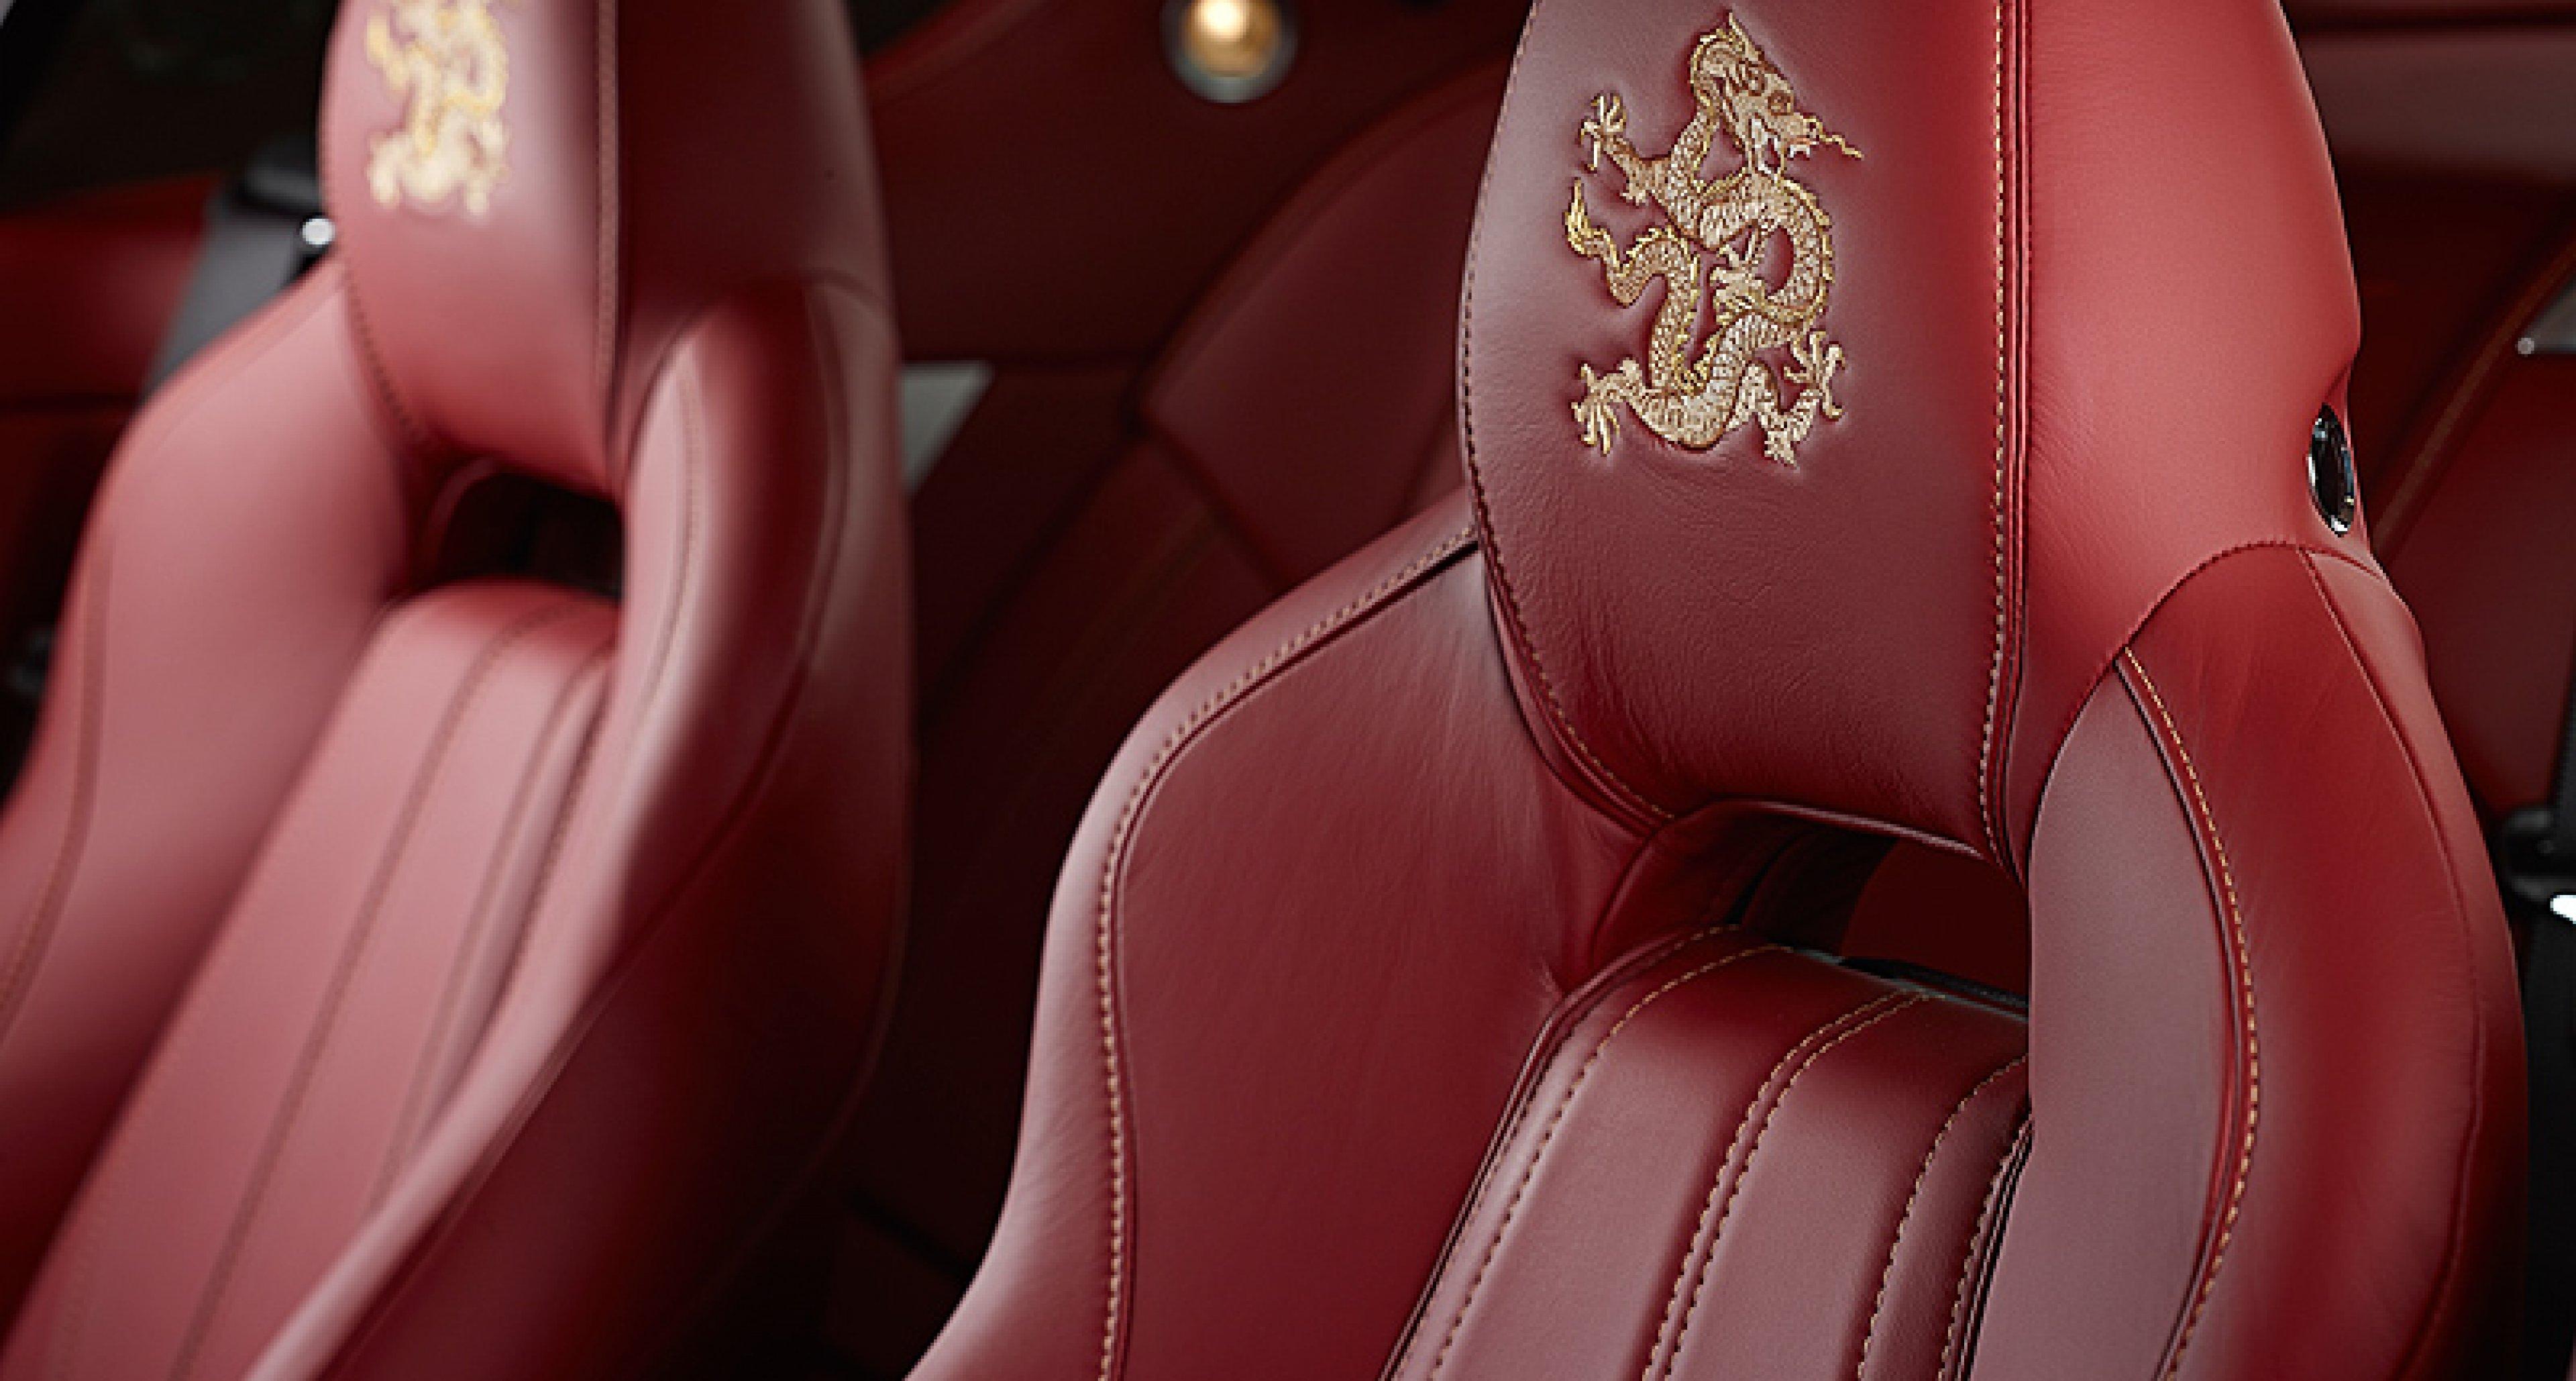 Aston Martin Dragon 88 Limited Editions: Enter the Dragon